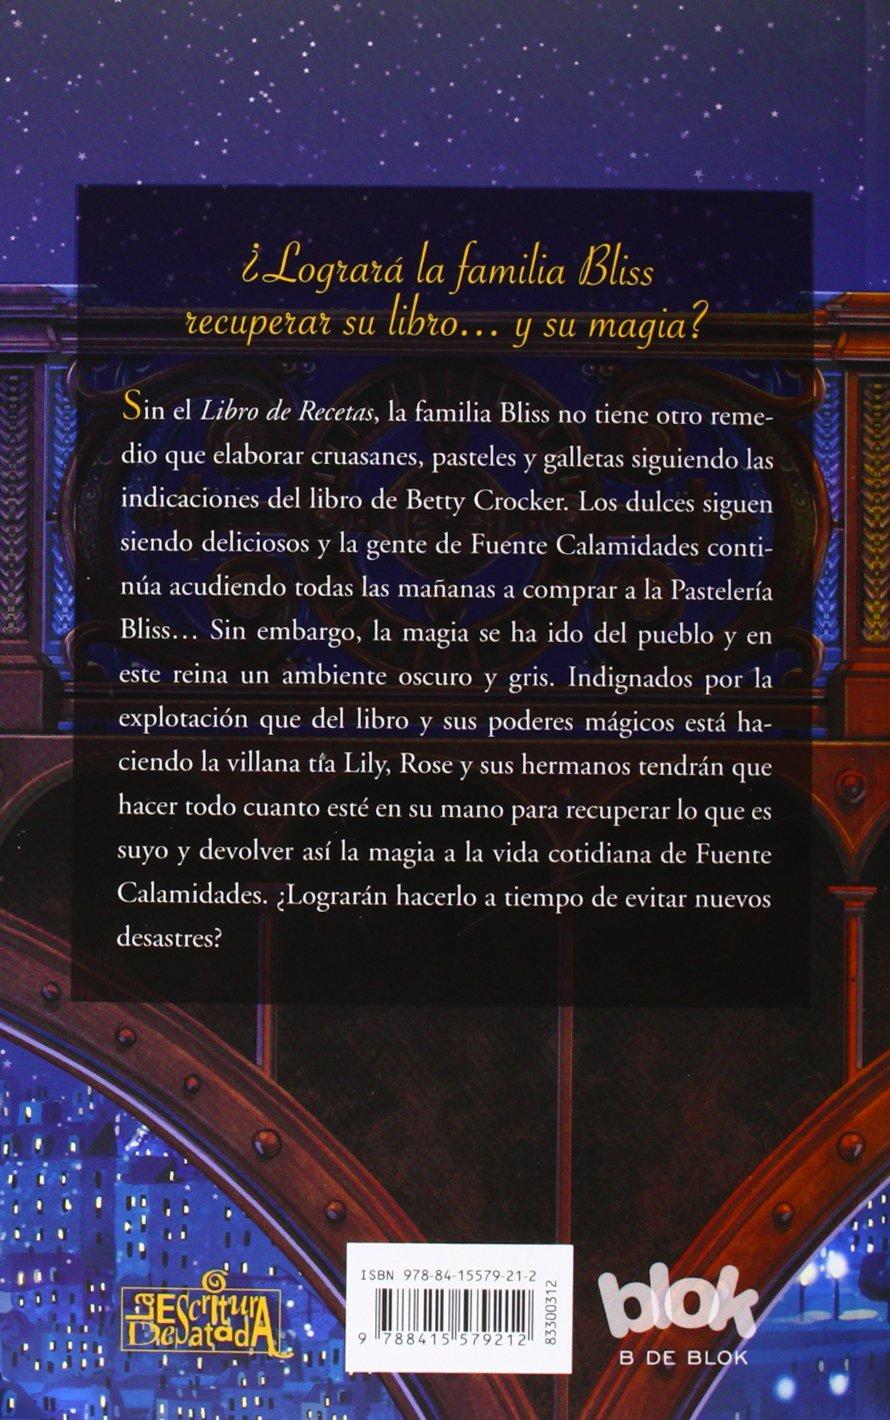 Un toque de magia / A Dash of Magic (La Pasteleria Bliss) (Spanish Edition): Kathryn Littlewood, Olivia Llopart: 9788415579212: Amazon.com: Books